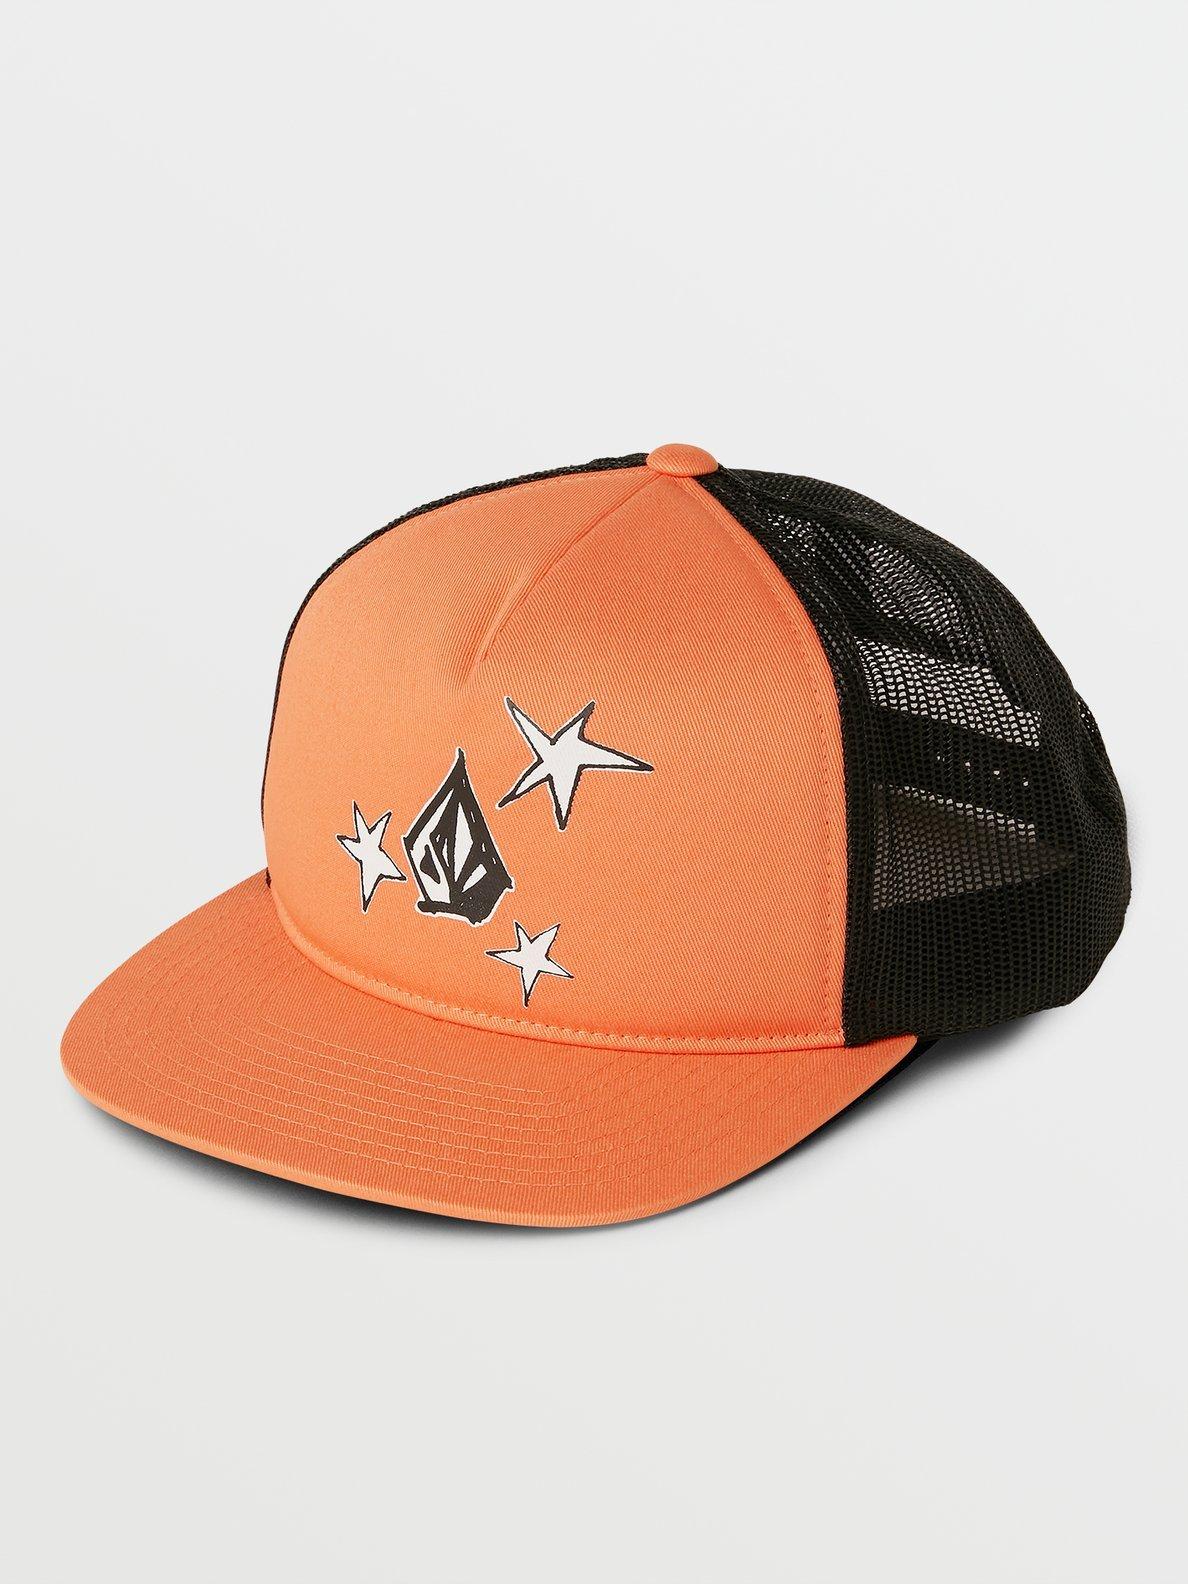 COMPANION CHEESE HAT